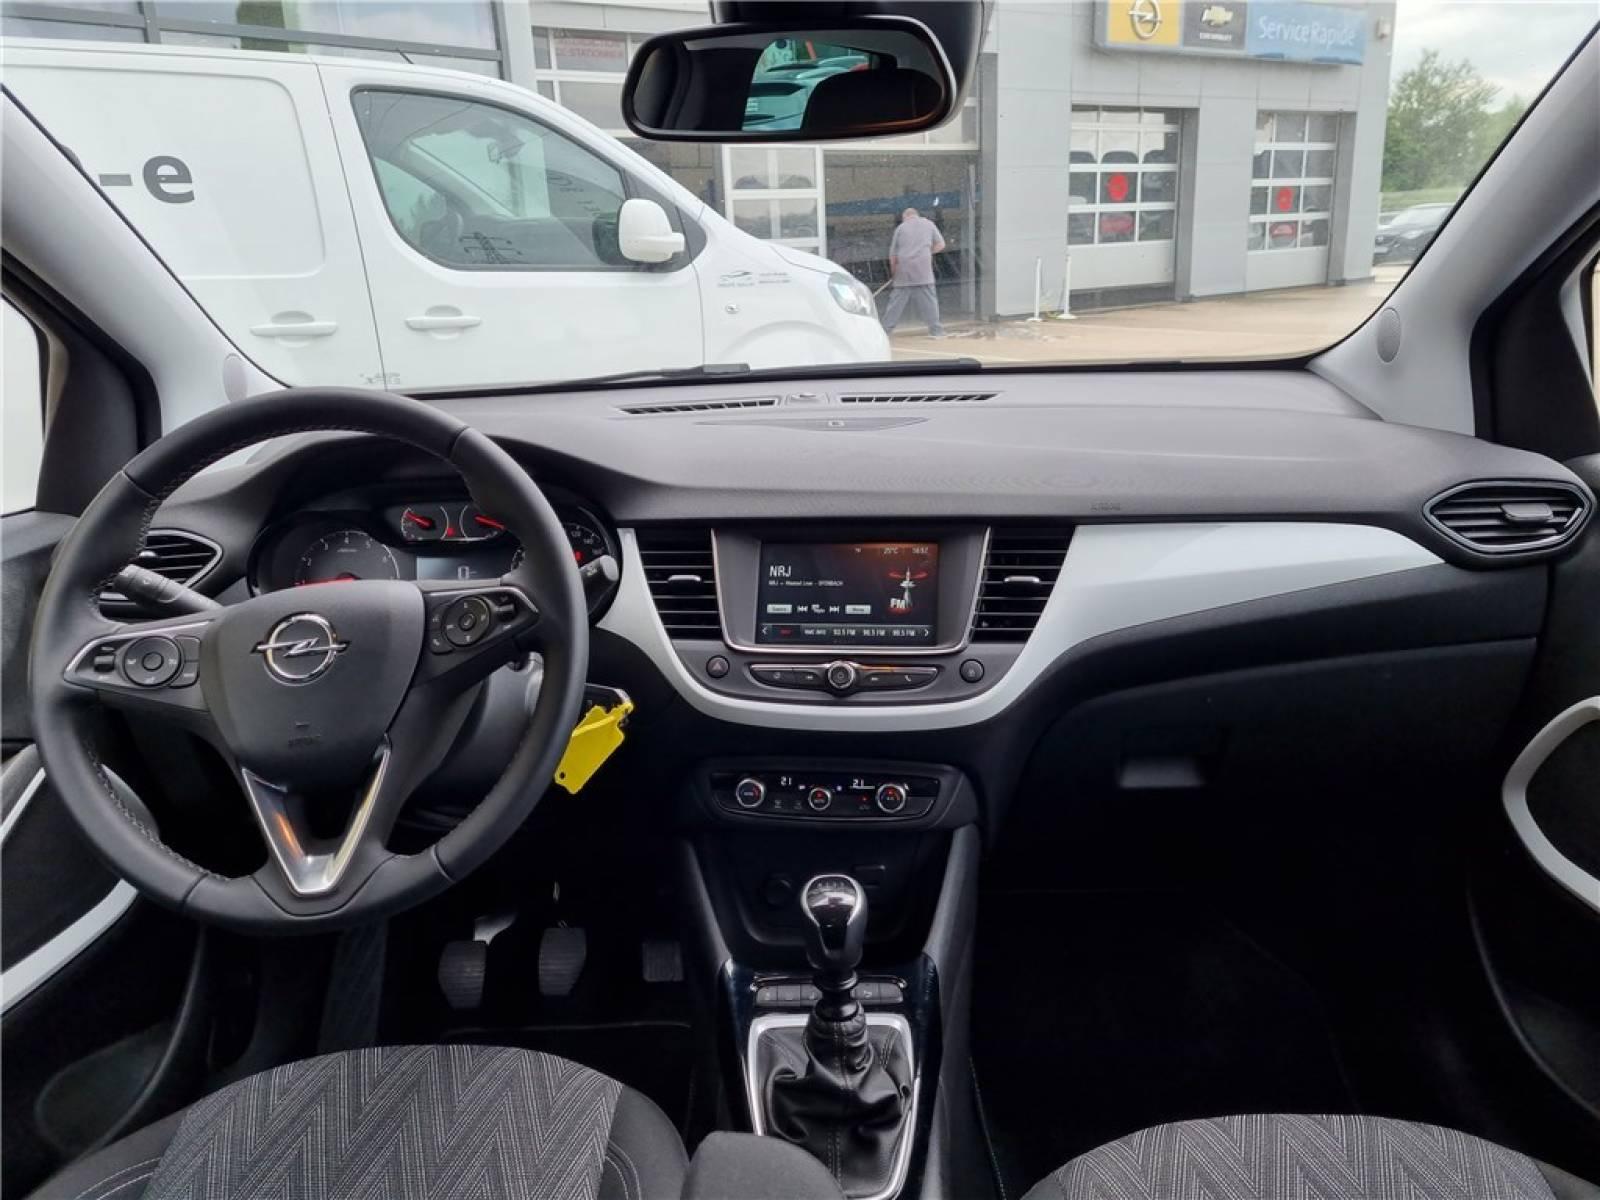 OPEL Crossland X 1.2 Turbo 110 ch - véhicule d'occasion - Groupe Guillet - Opel Magicauto - Chalon-sur-Saône - 71380 - Saint-Marcel - 20